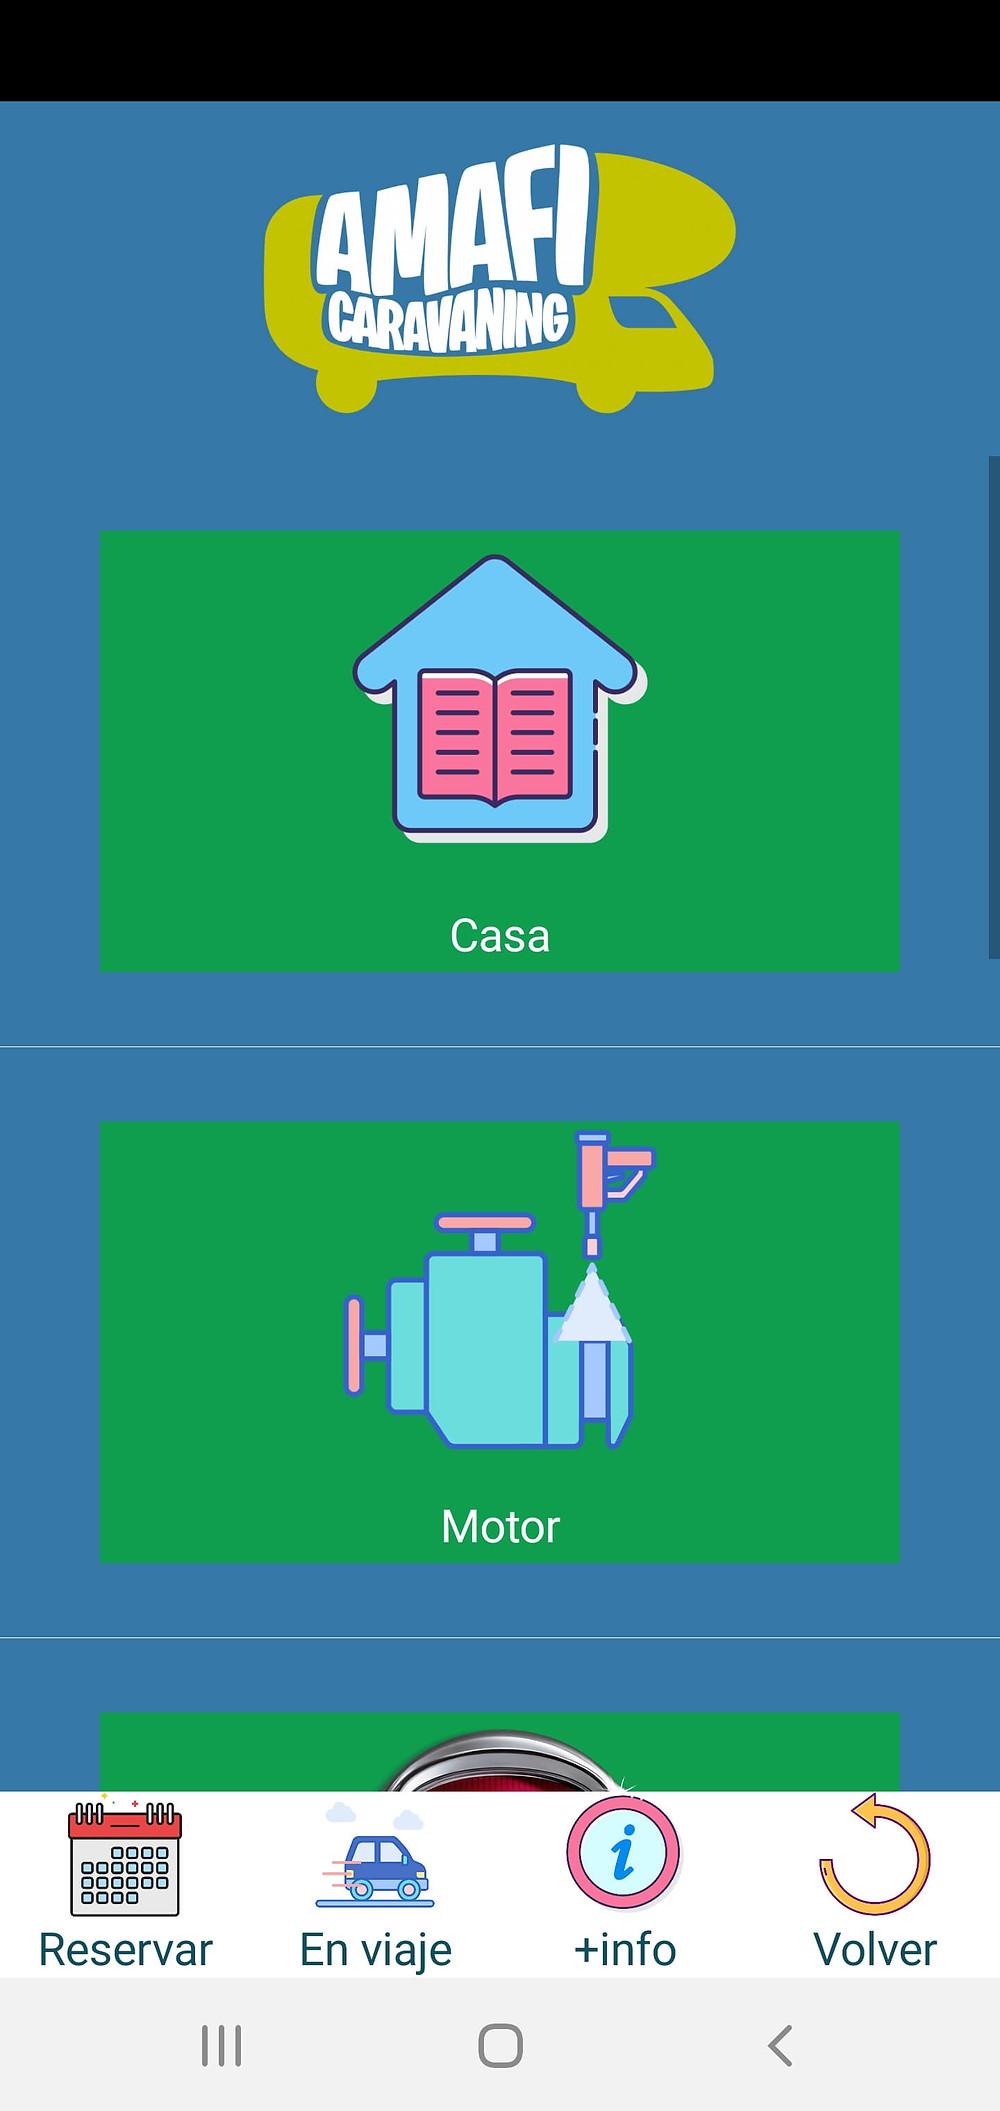 manuales de uso de motorhome